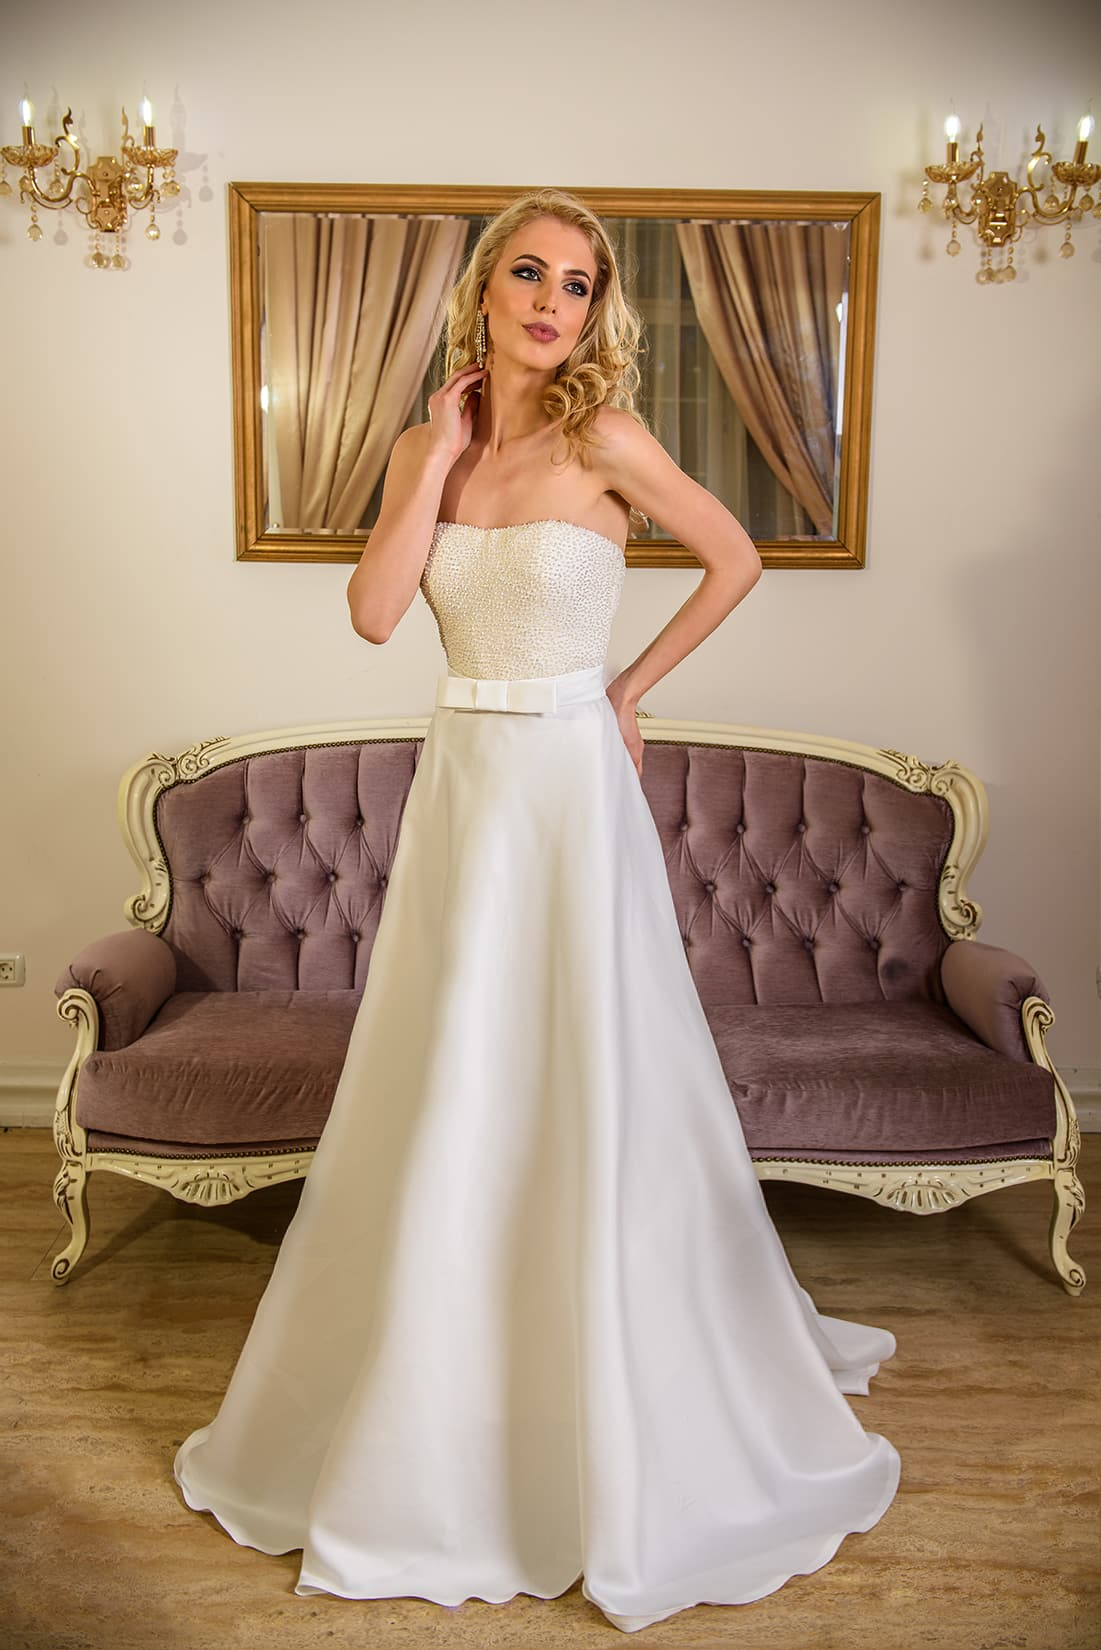 Nicolette Model - Colectia Baroque - Adora Sposa